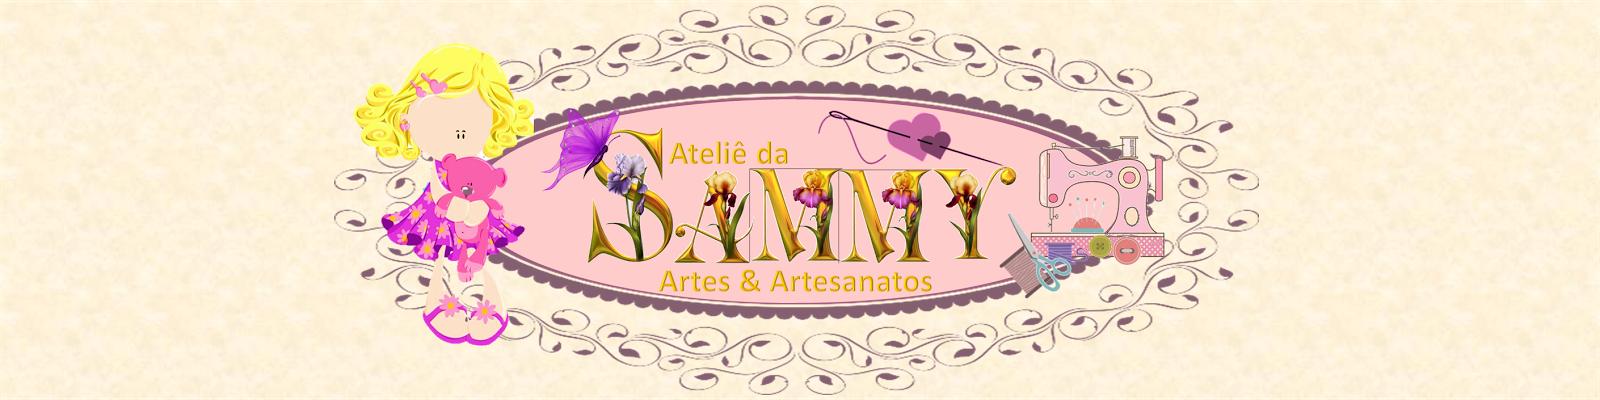 Ateliê da Sammy Artesanatos